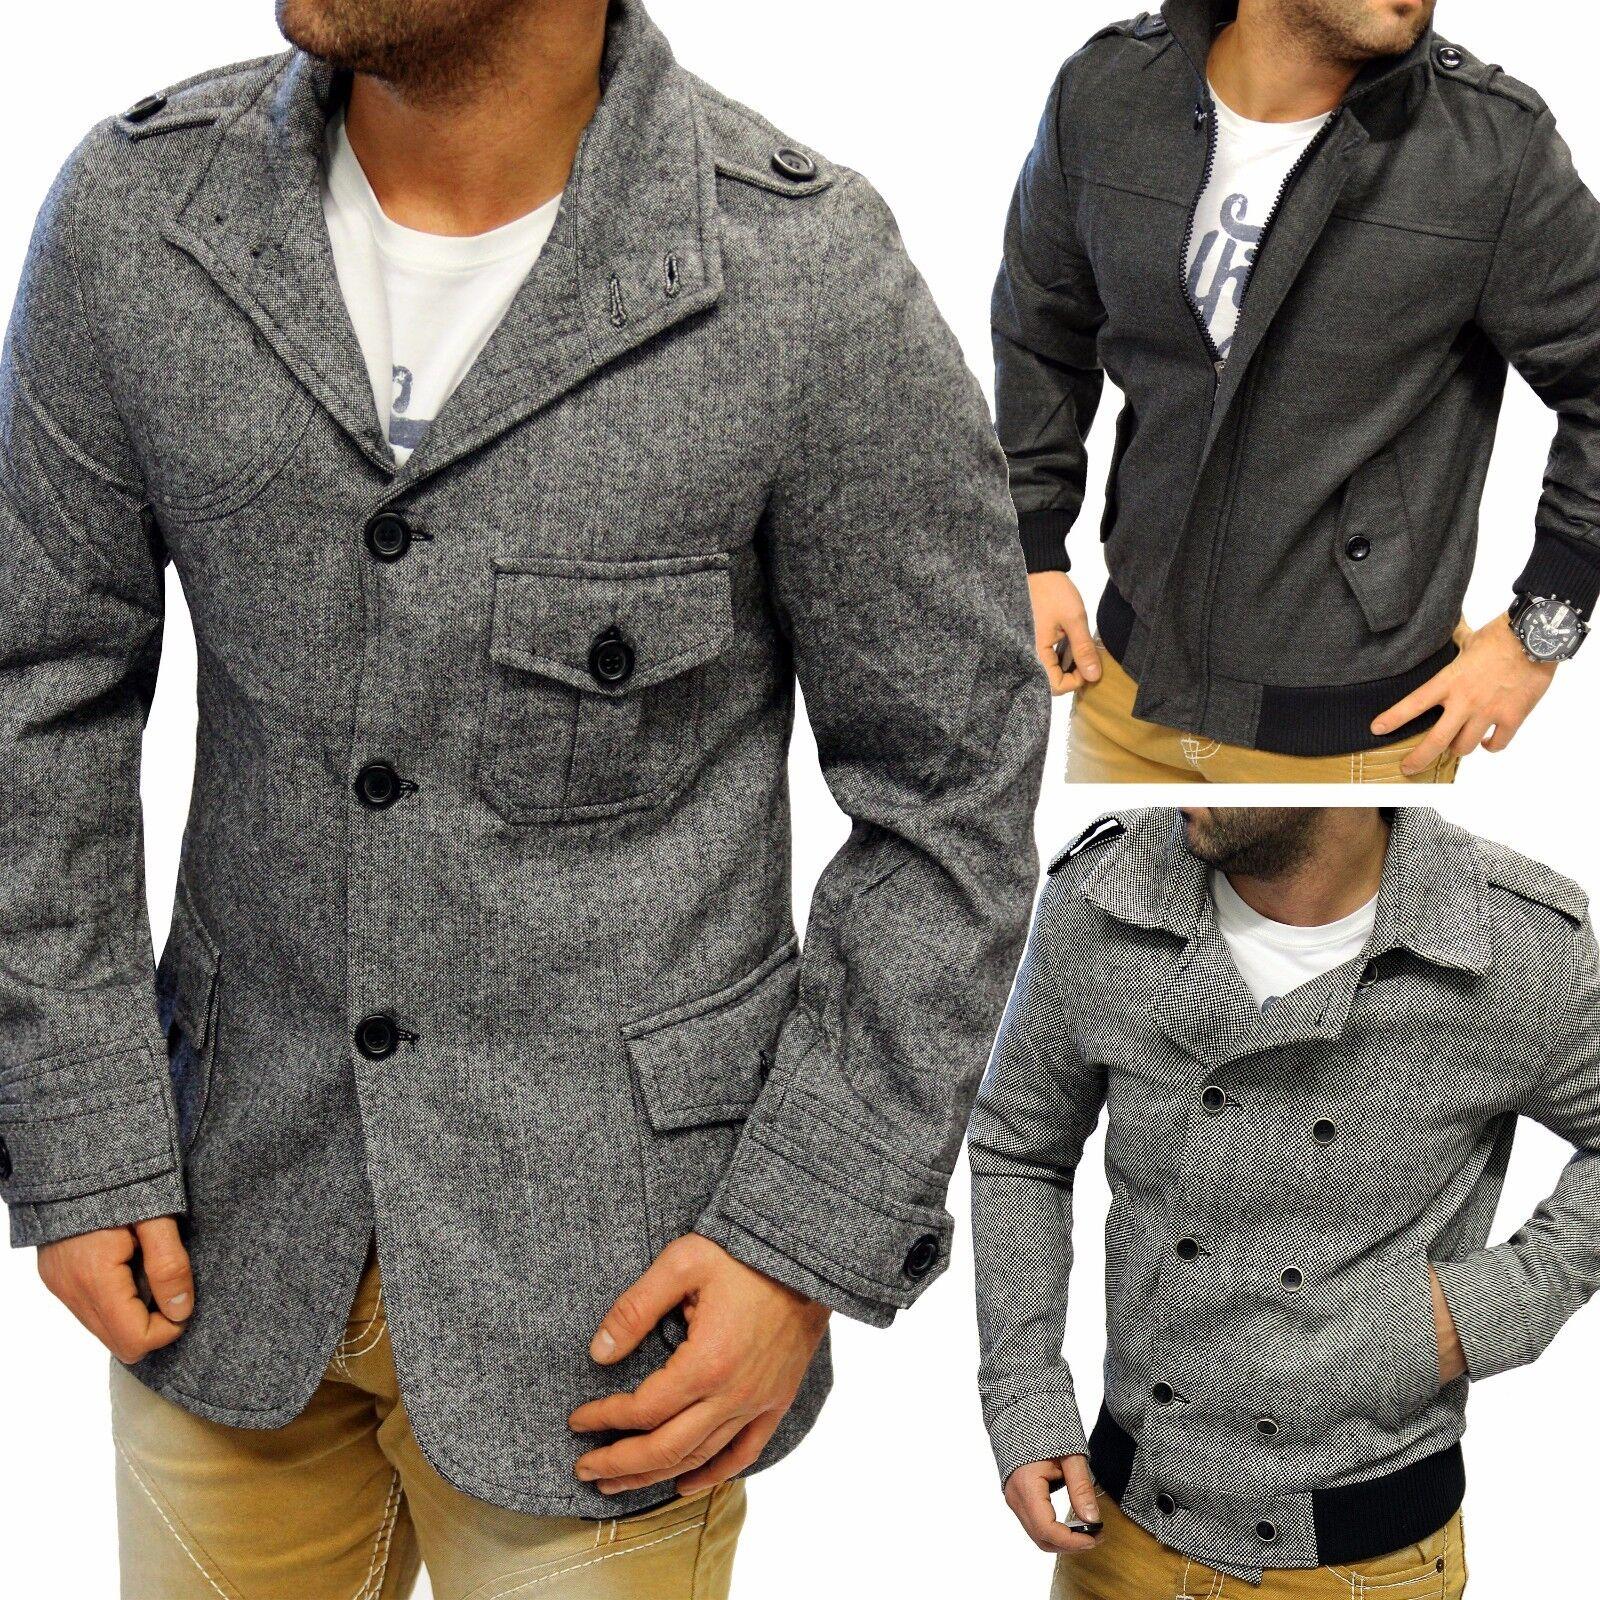 Jeel hombre chaqueta de invierno abrigo Textil Cazadora cálido Gabardina